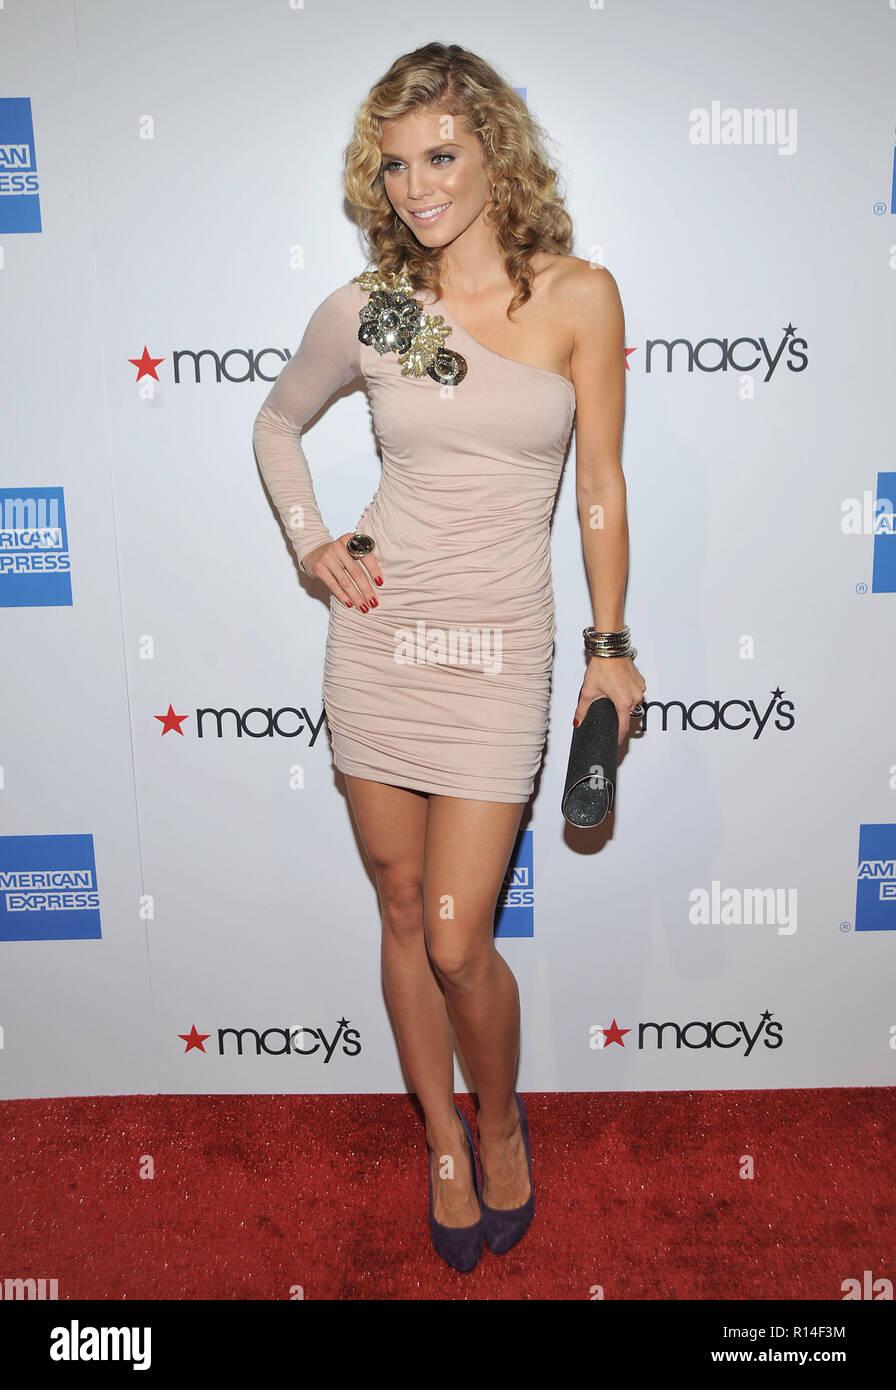 Celebrity Celeste T nudes (58 images), Pussy